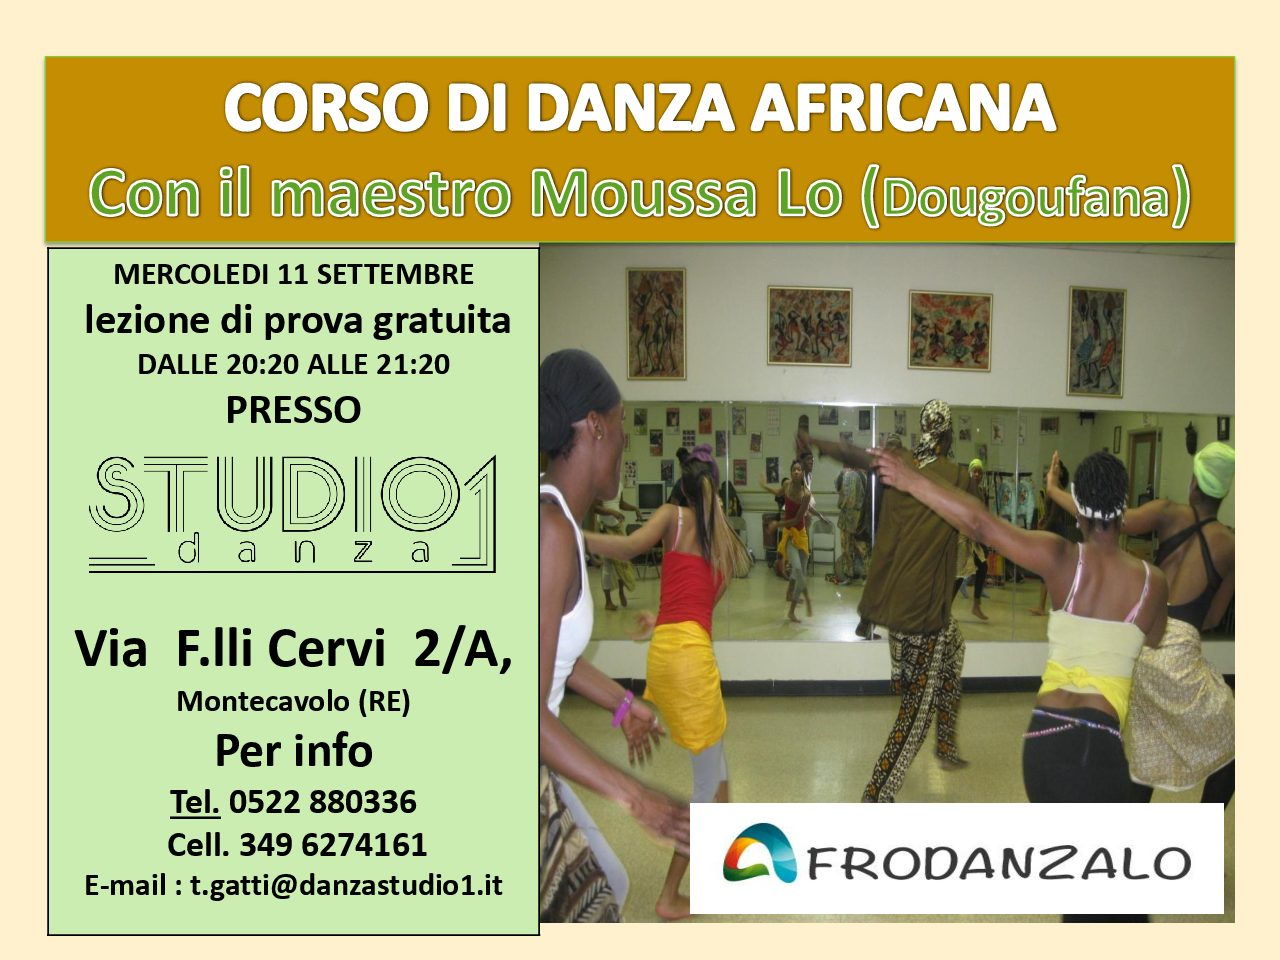 Corso di danza africana a Montecavolo – Mercoledì 11 settembre